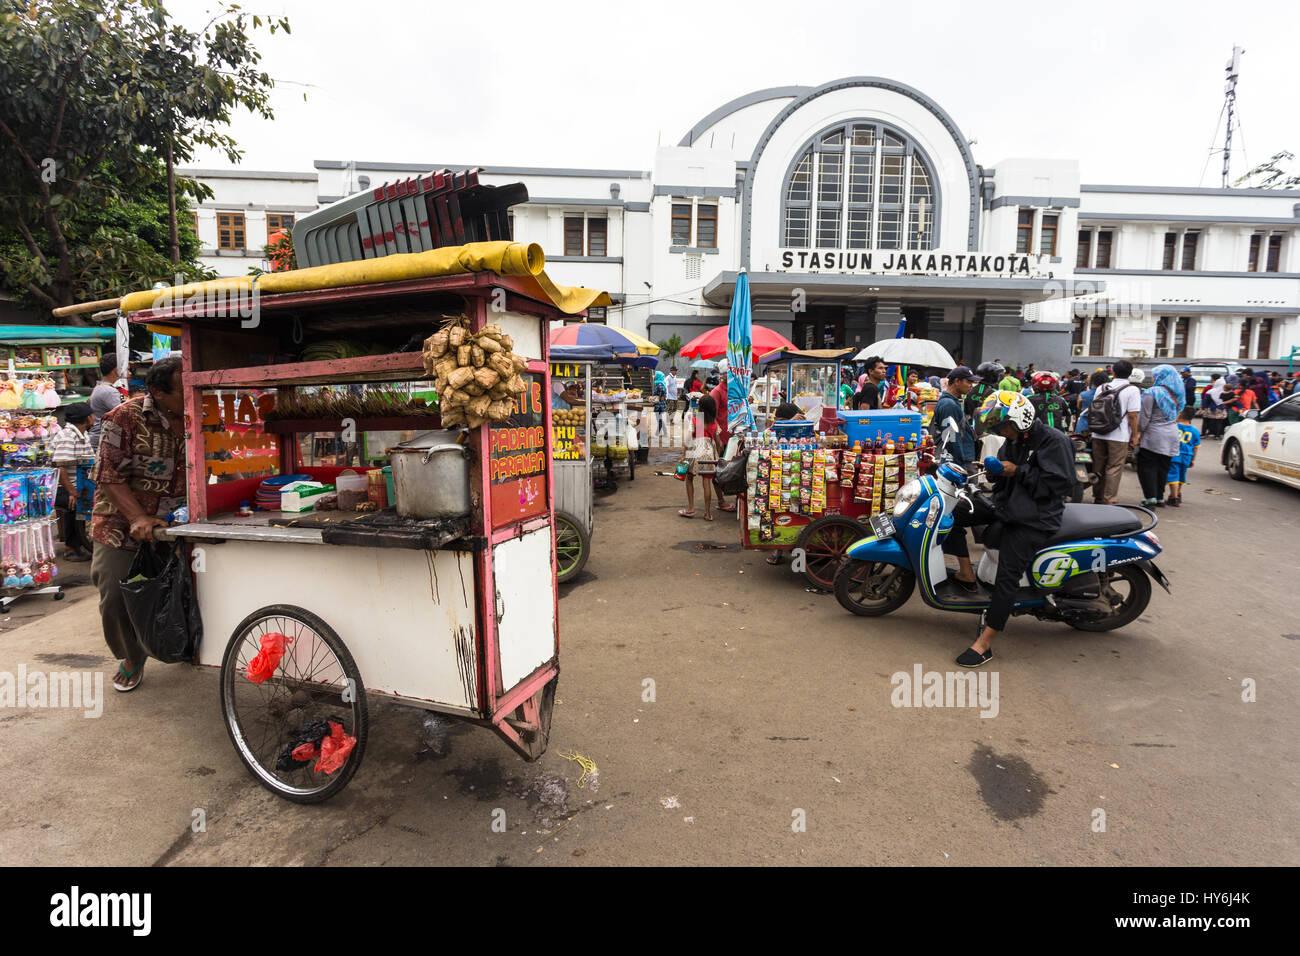 JAKARTA, INDONESIA - FEBRUARY 12, 2017: Street food vendors wait for customers in front of the Jakarta Kota train - Stock Image